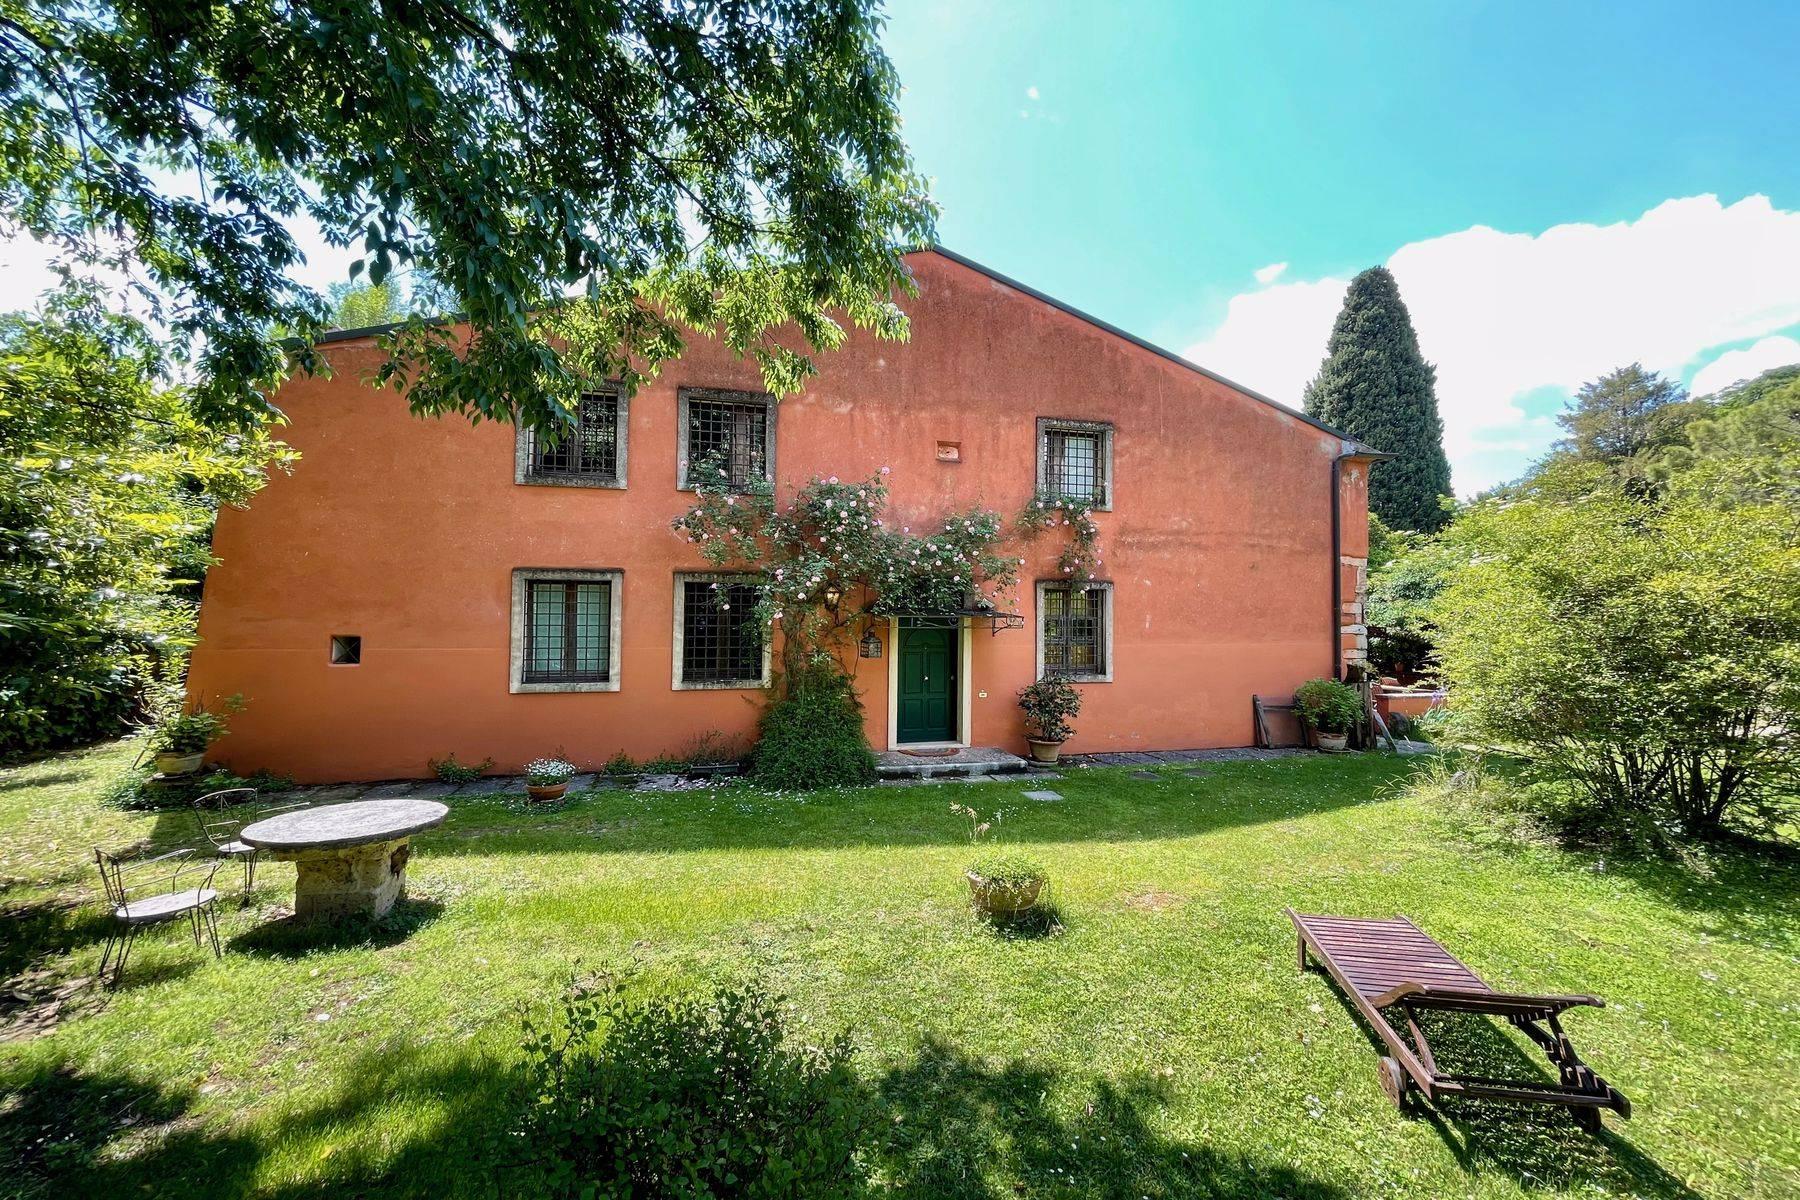 Rustico in Vendita a Verona: 5 locali, 350 mq - Foto 1